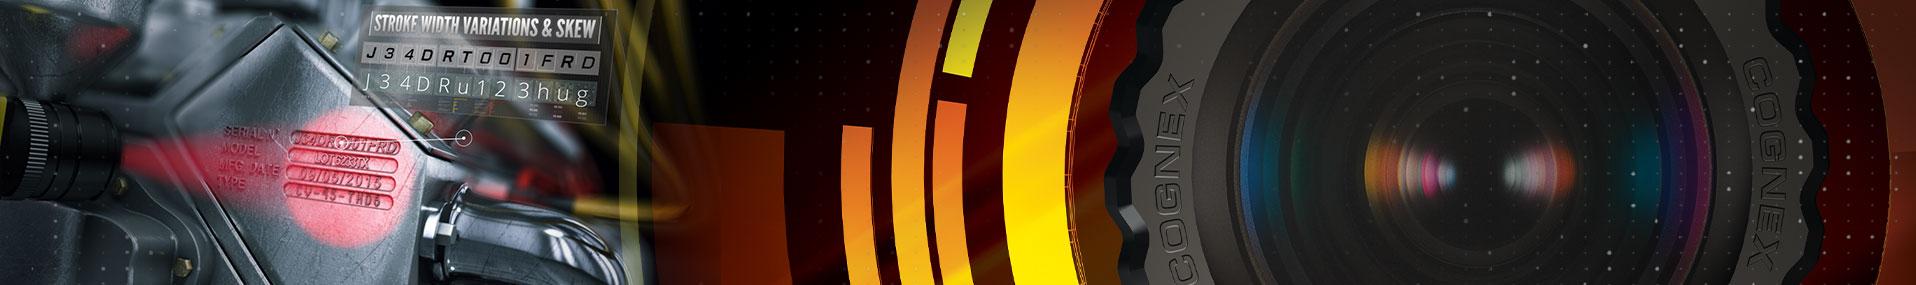 red light OCR reading cast code next to machine vision cognex lens